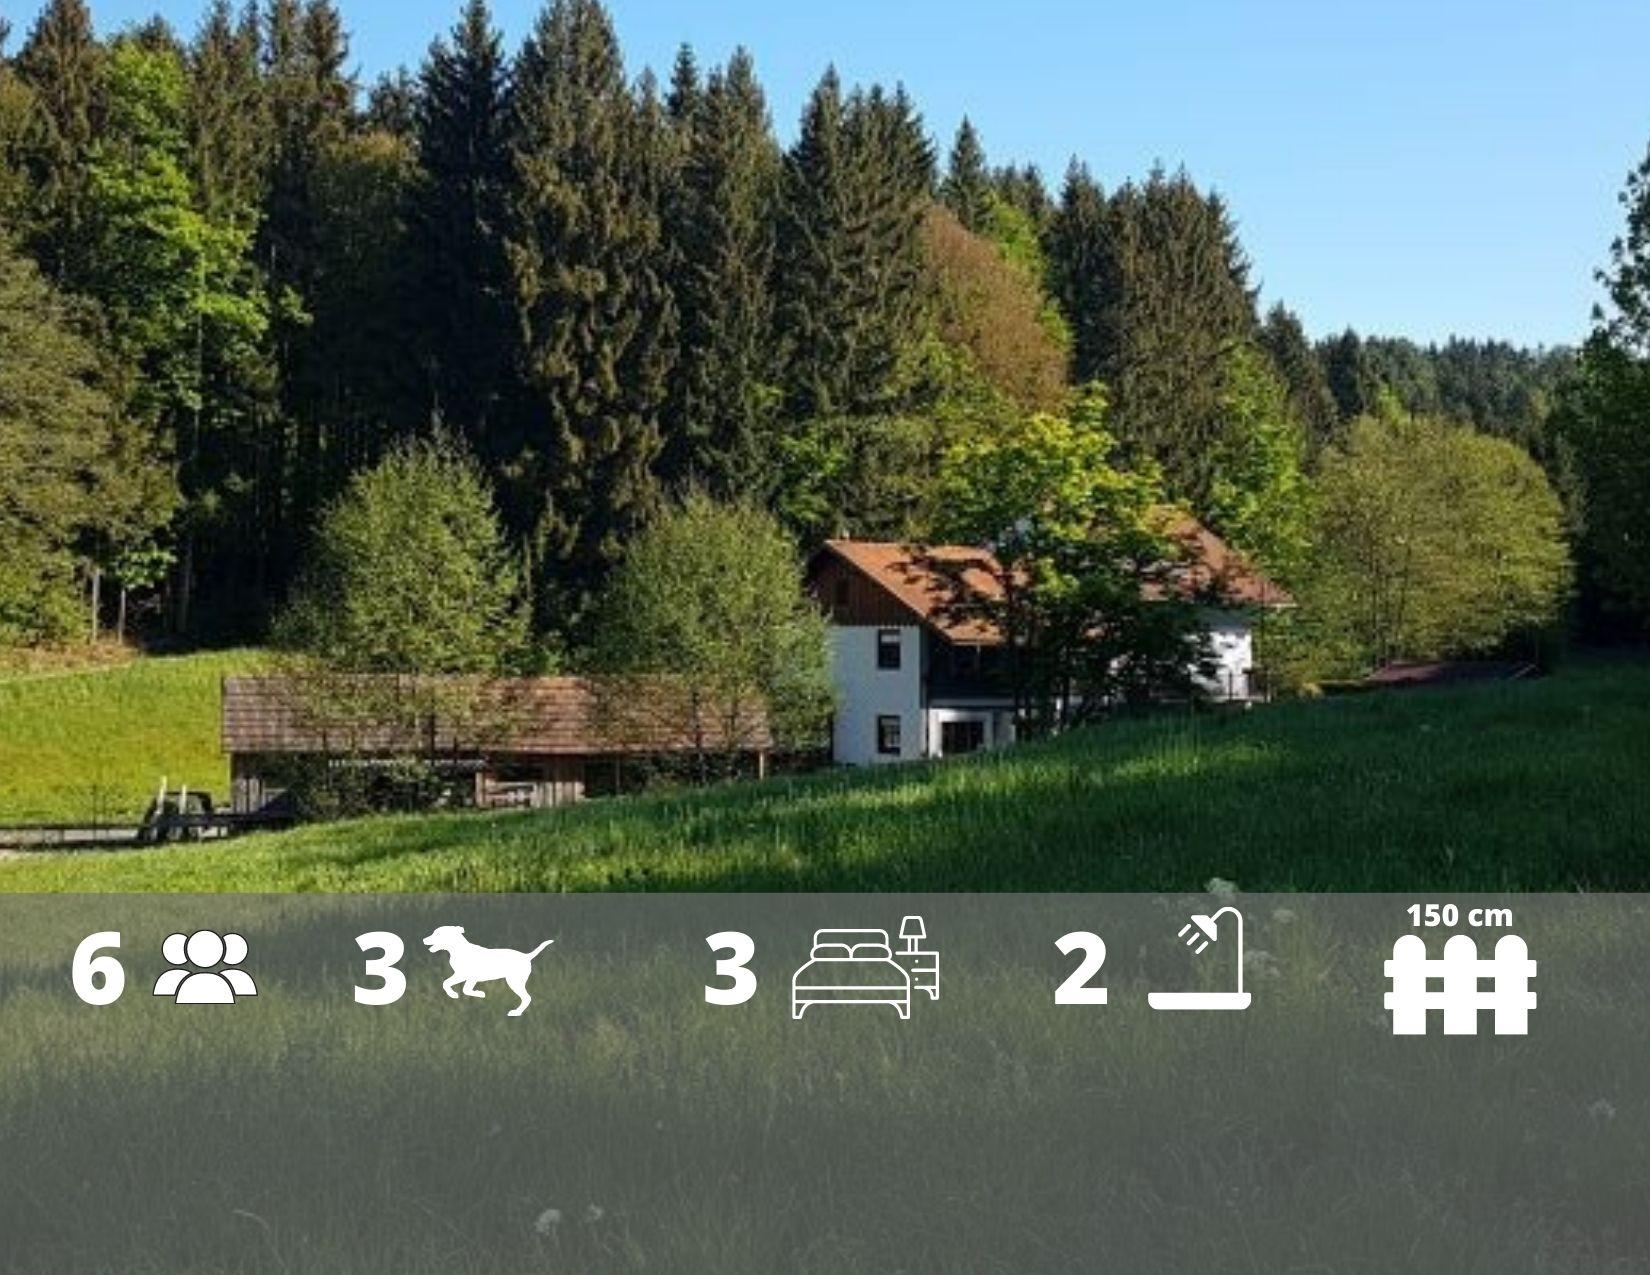 Ferienhaus Sacherl mitten im Wald, WLAN, Garten, Swimmingpool